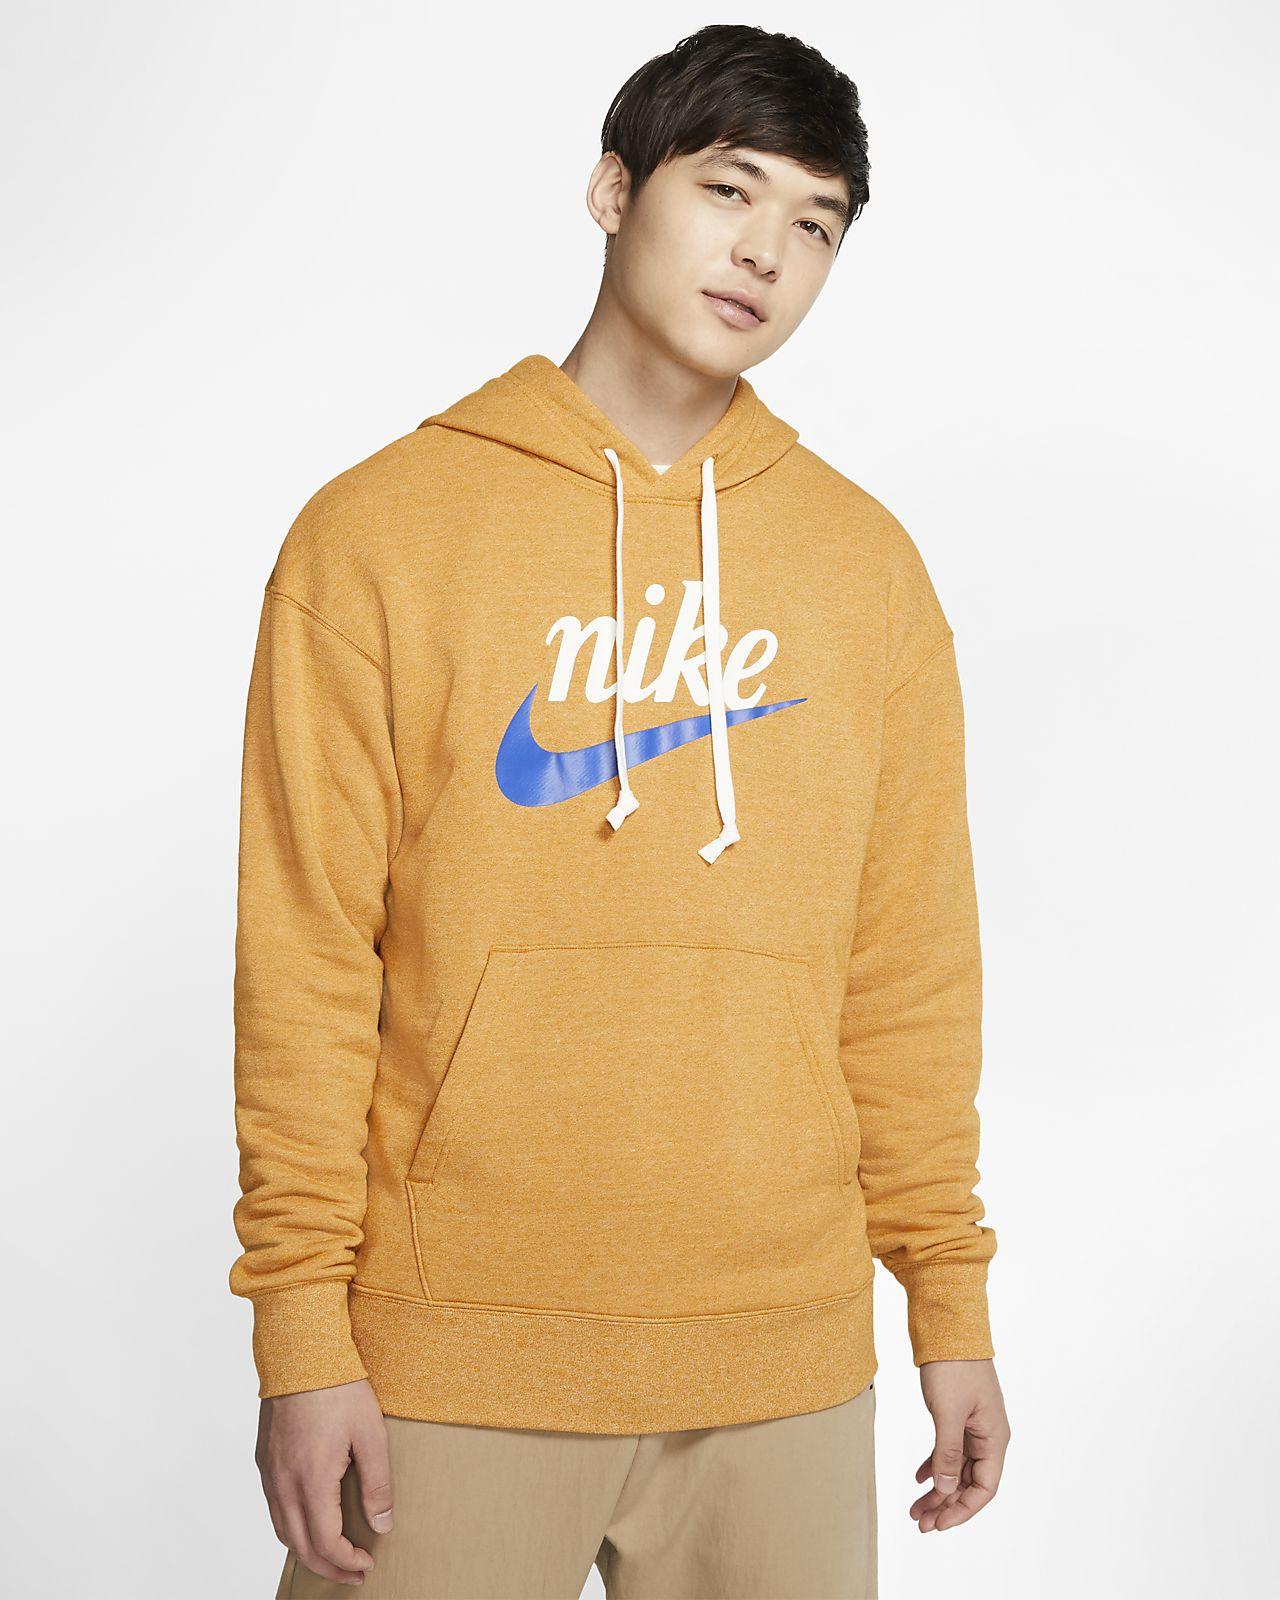 nike sweatshirts without hoods | Mens sweatshirts, Mens